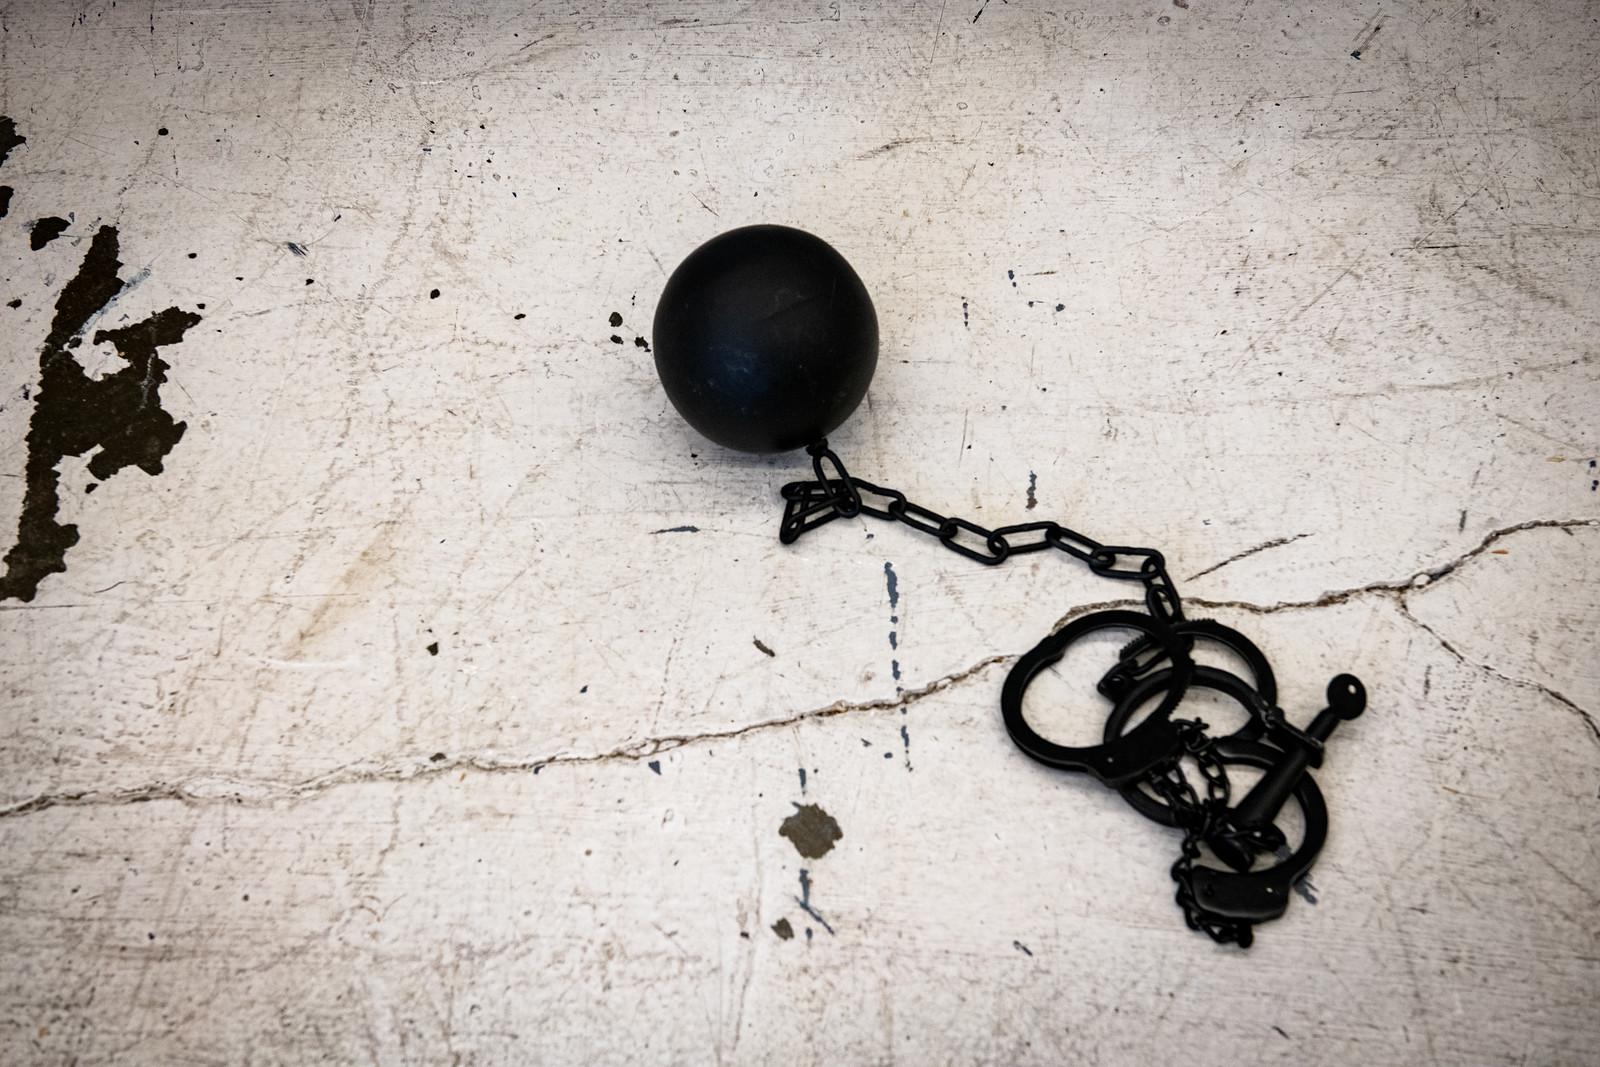 Handcuff.jpg